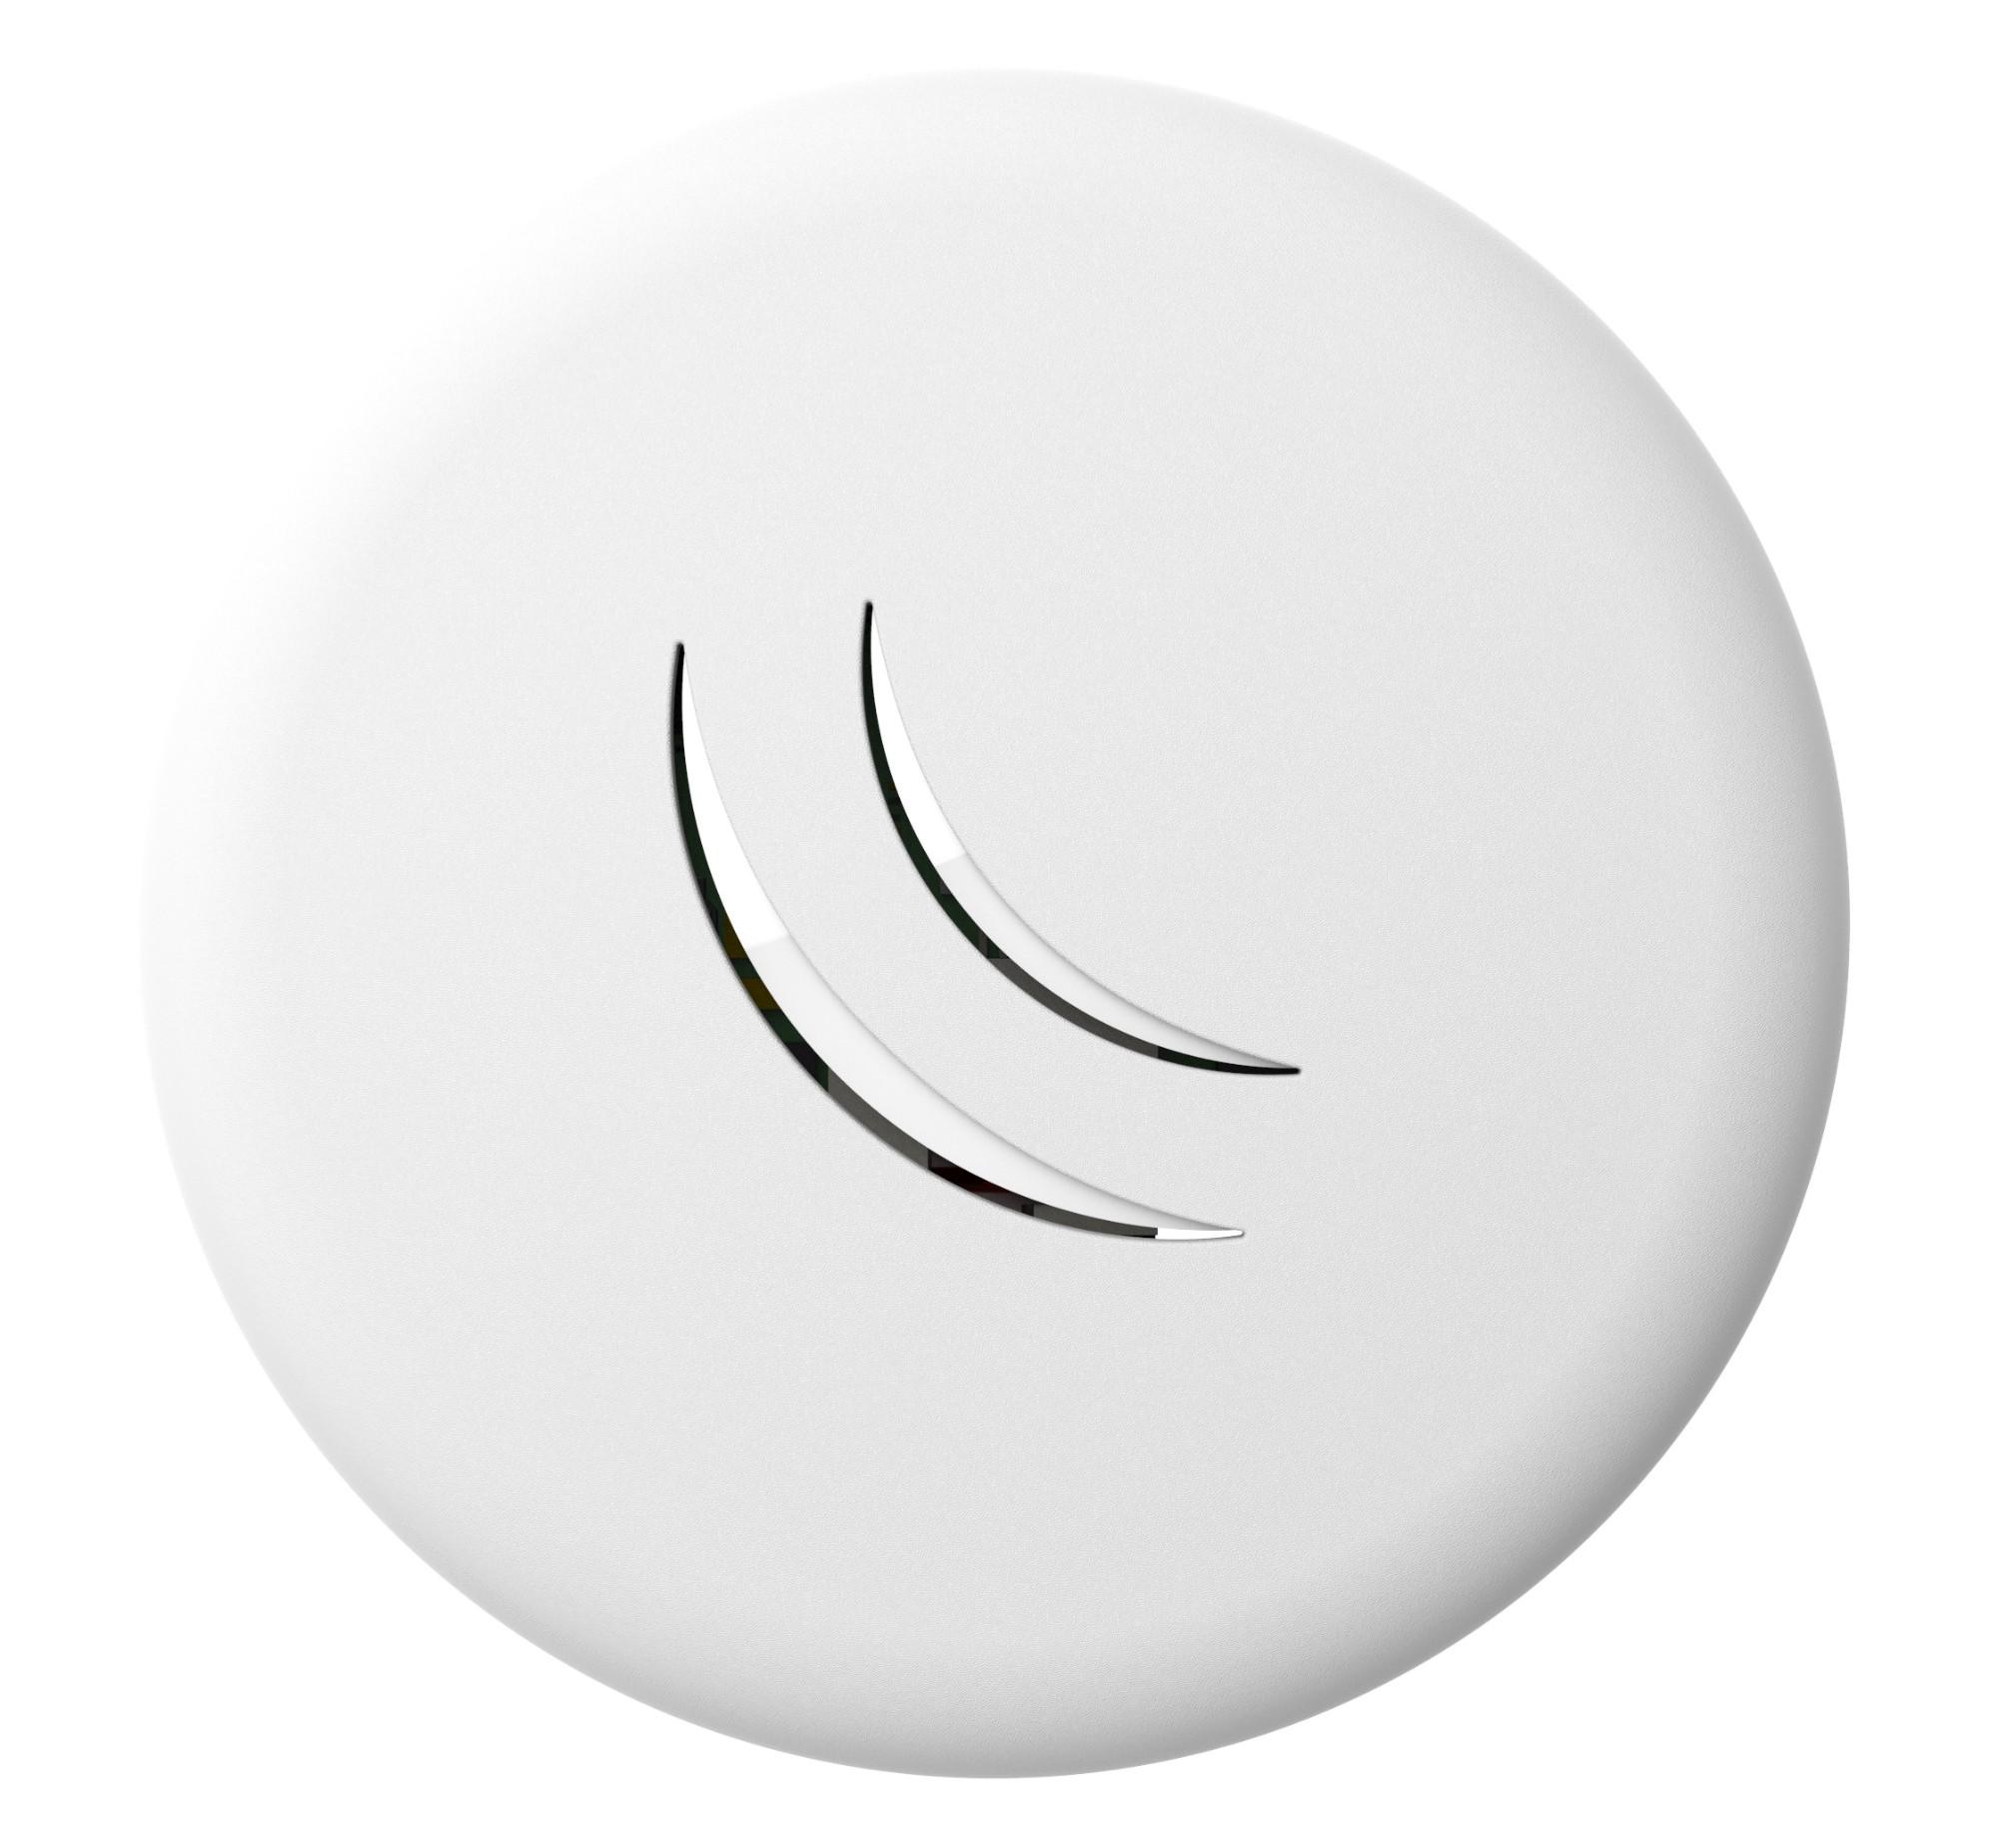 Mikrotik cAP lite 54Mbit/s Power over Ethernet (PoE) White WLAN access point